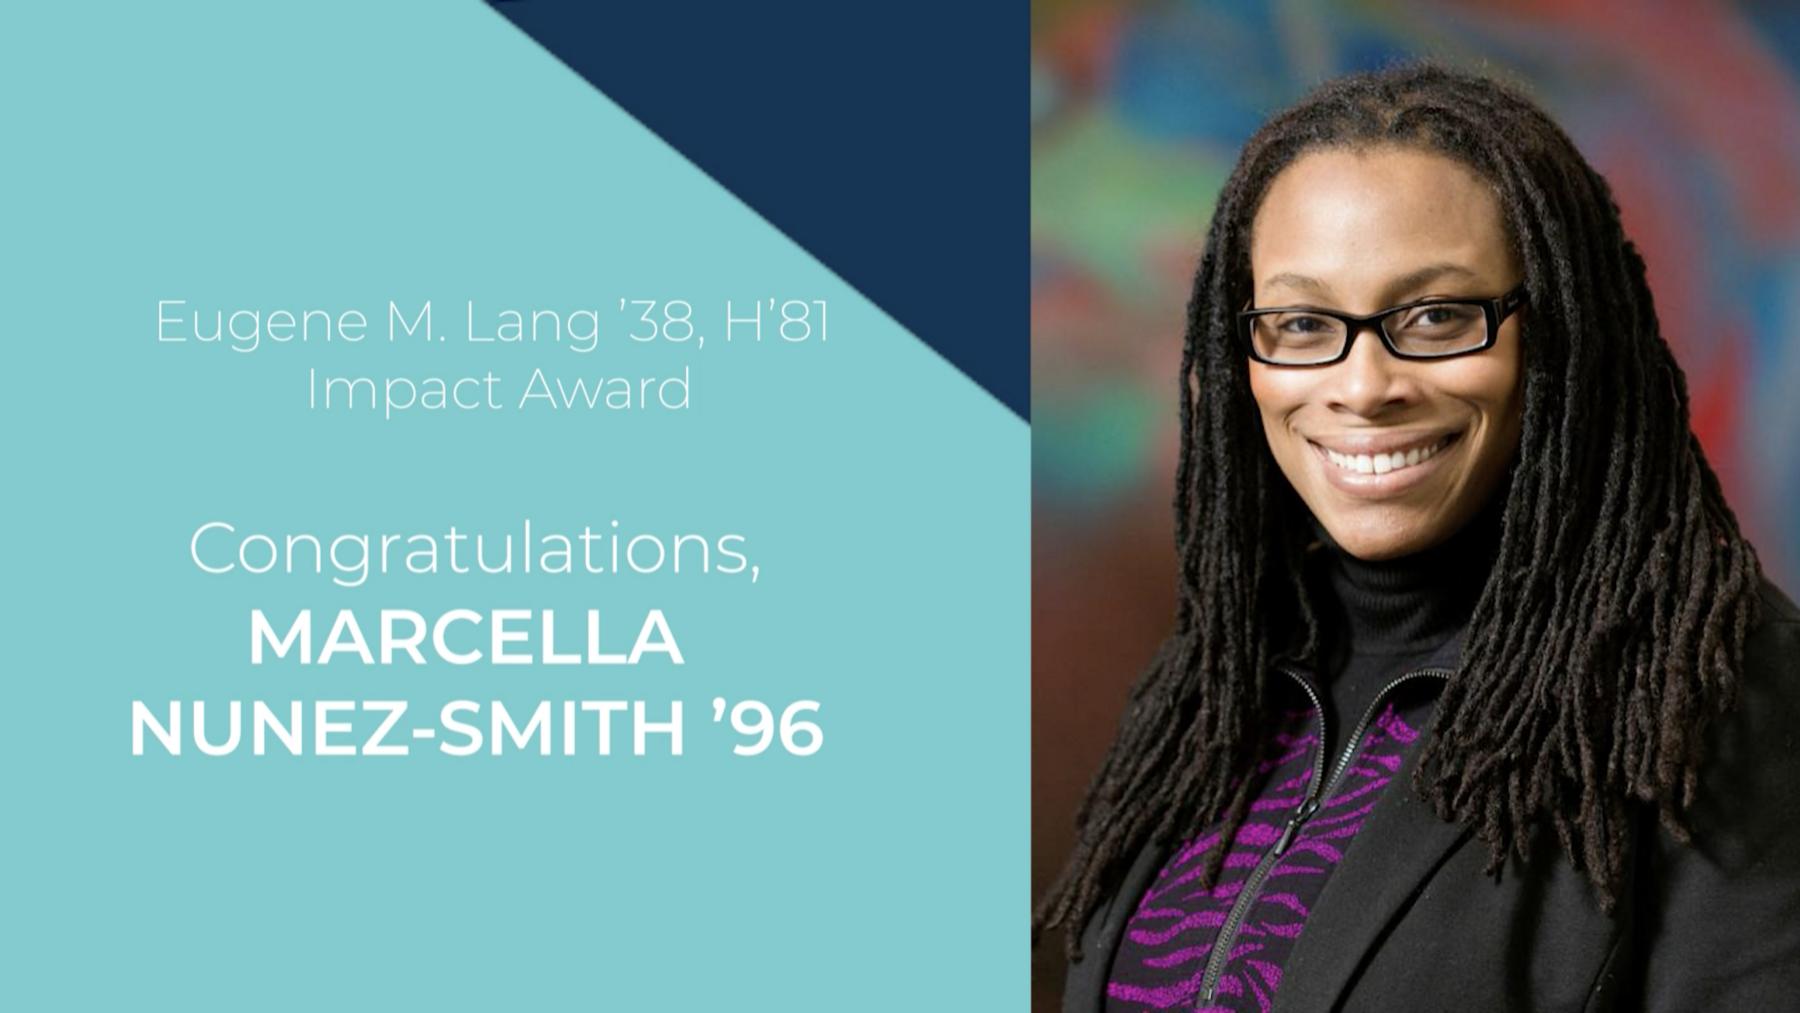 Congratulations, Marcella Nunez-Smith '96